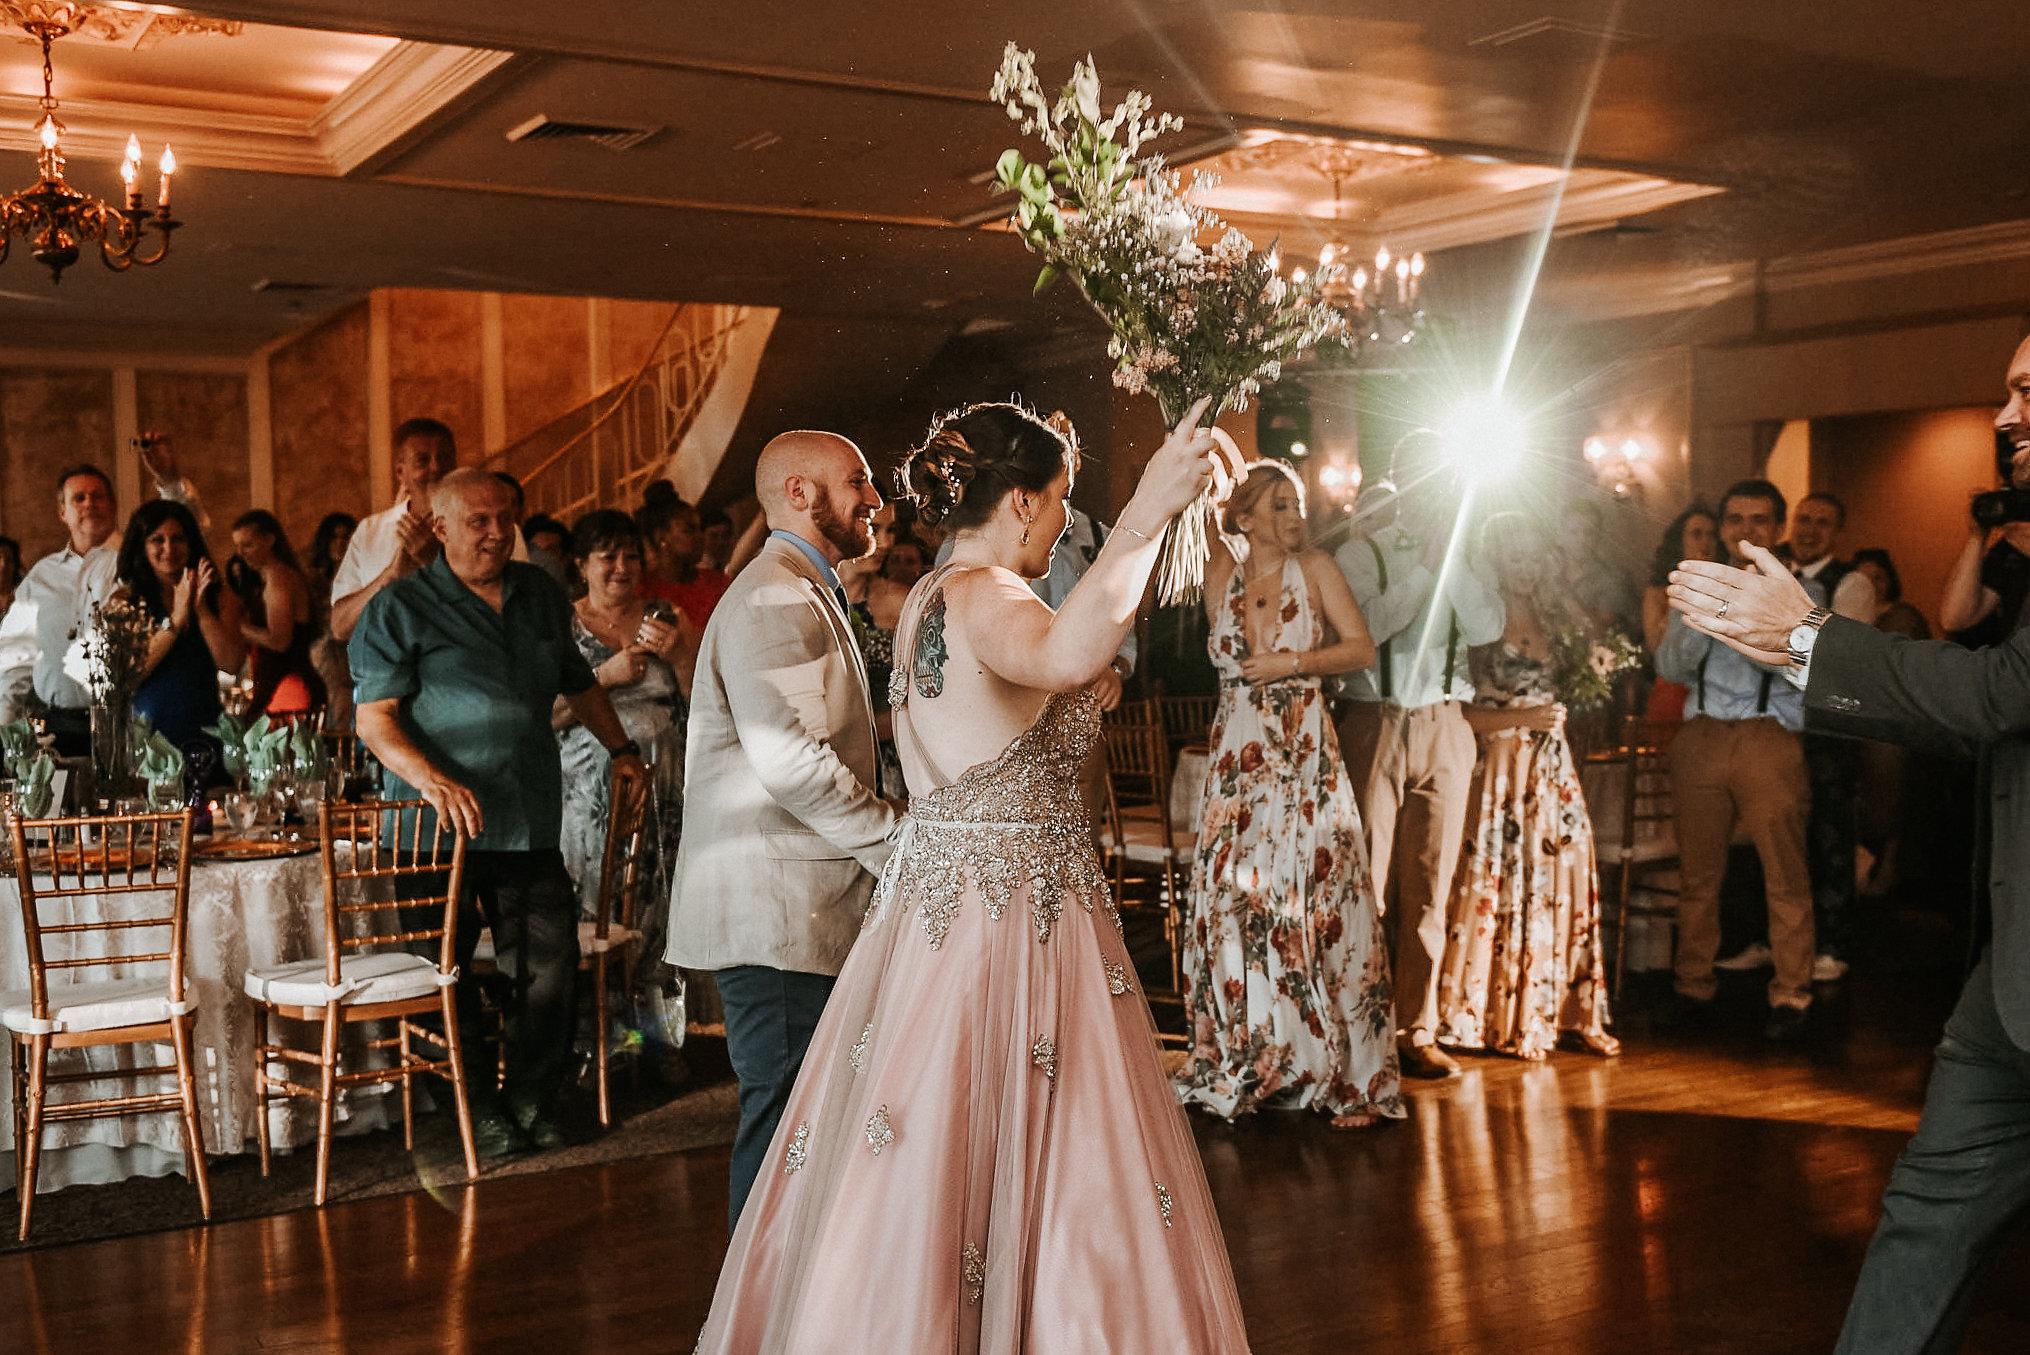 Bride and groom arriving at dance floor